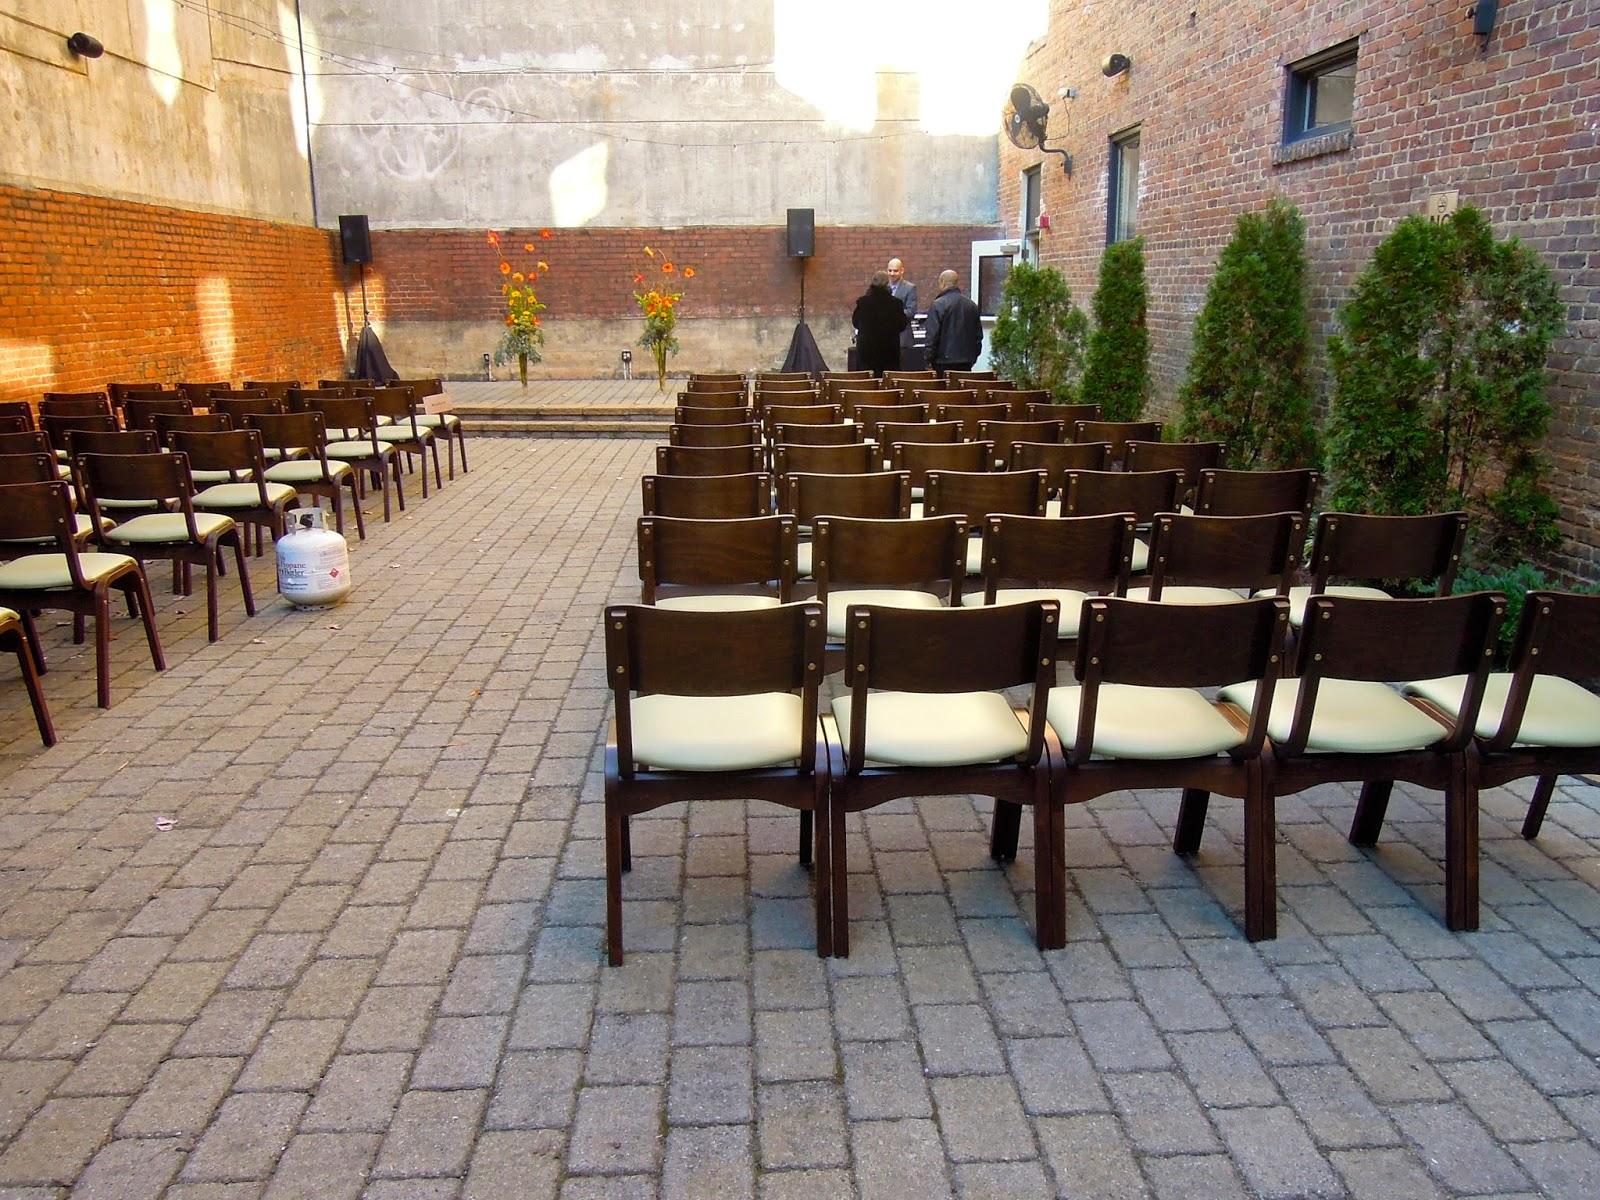 Raleigh Wedding Blog: Ann Marie and Ken\'s Wonderful Wedding at Sitti!